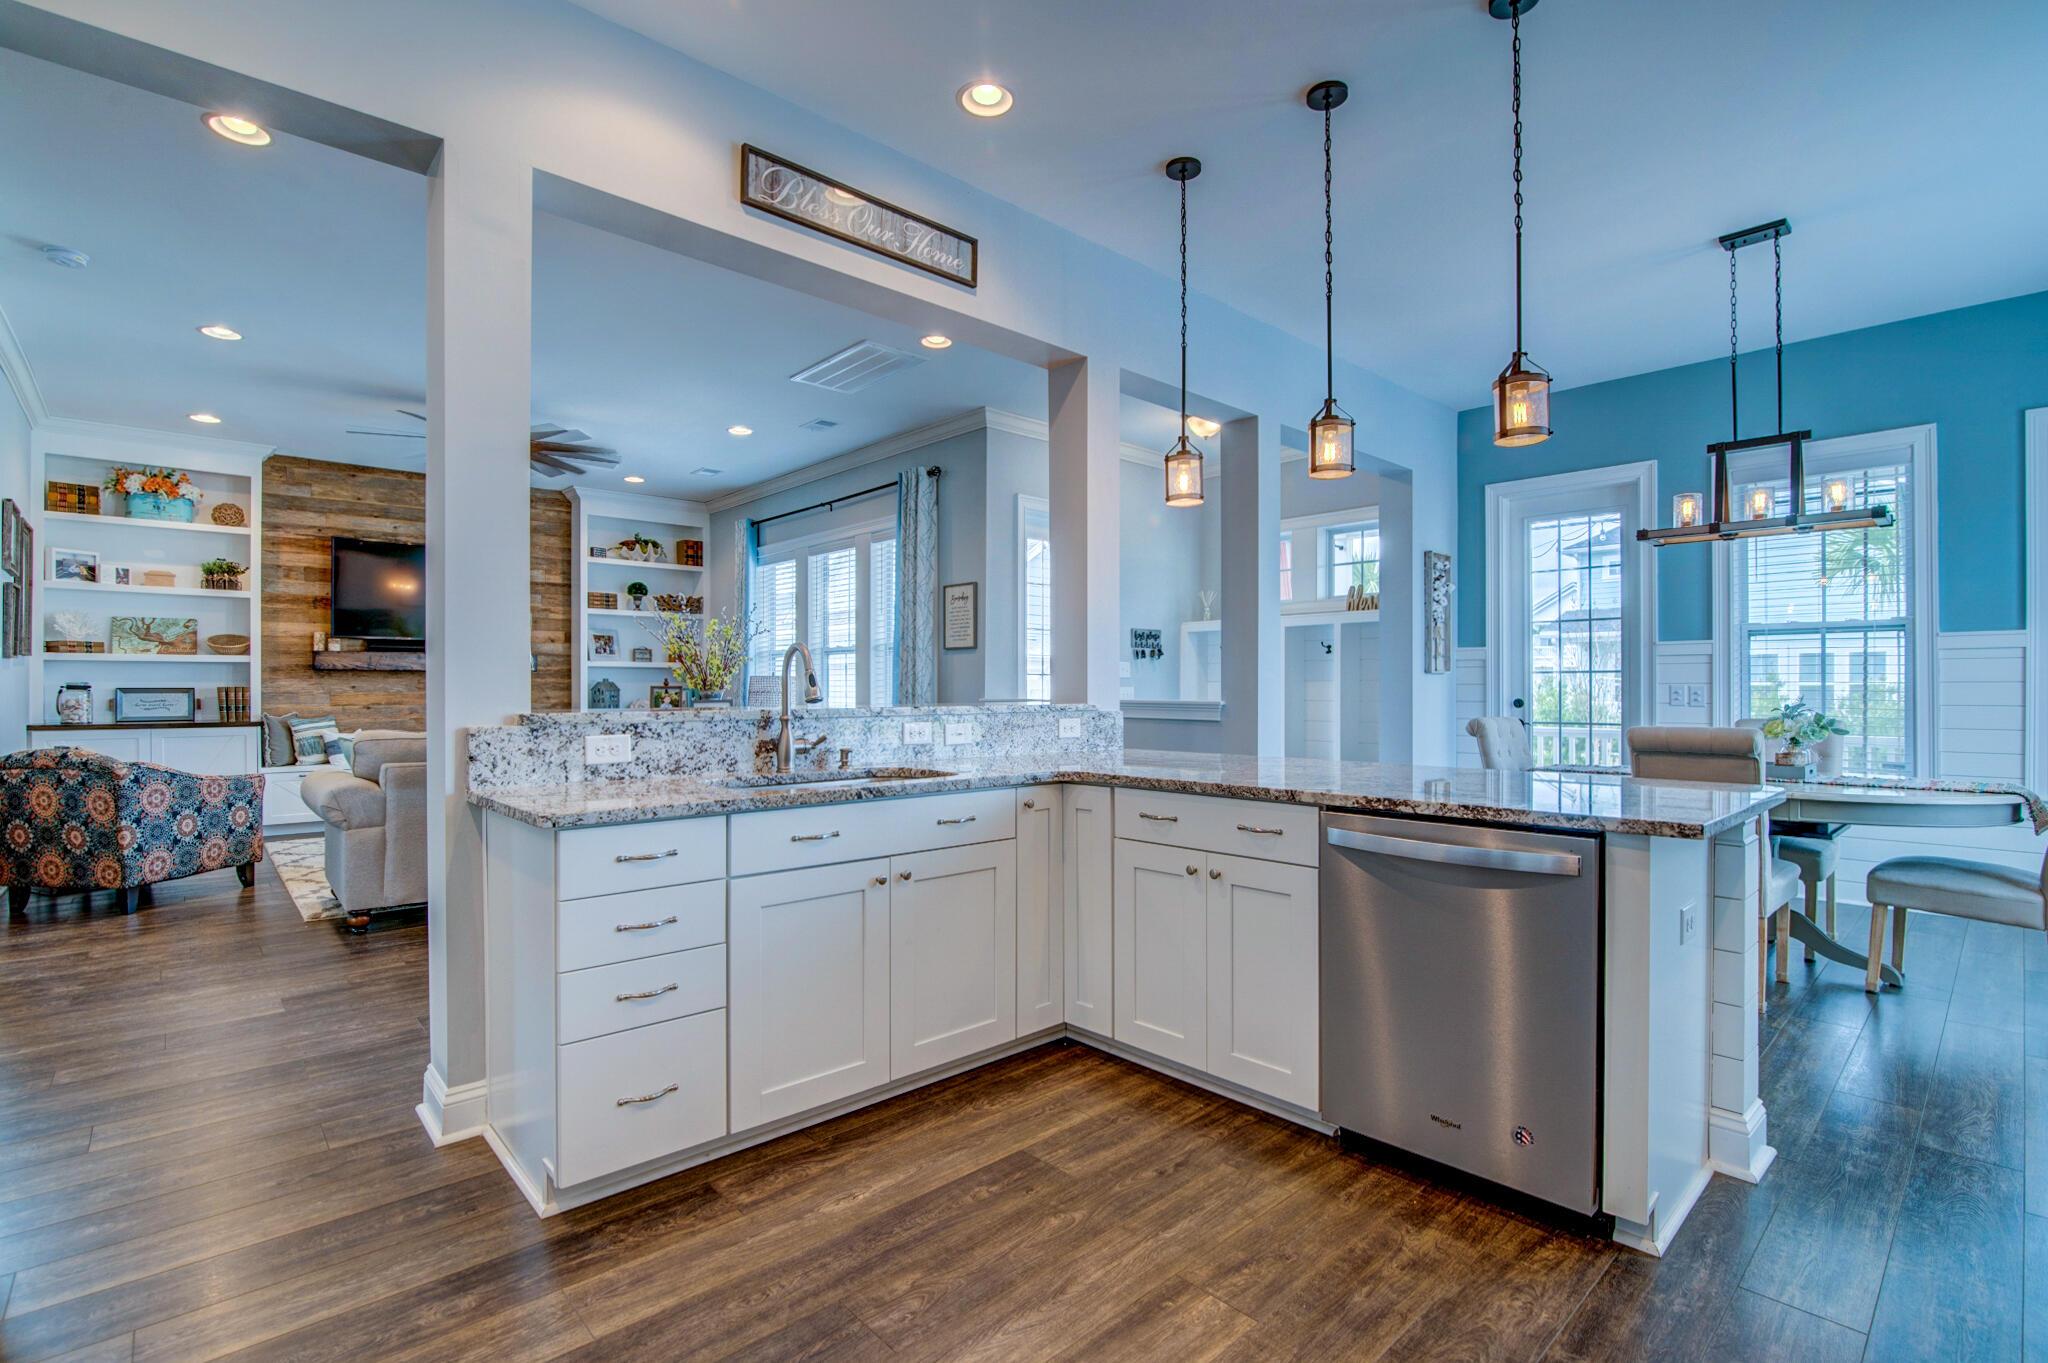 Carolina Park Homes For Sale - 3634 Spindrift, Mount Pleasant, SC - 27